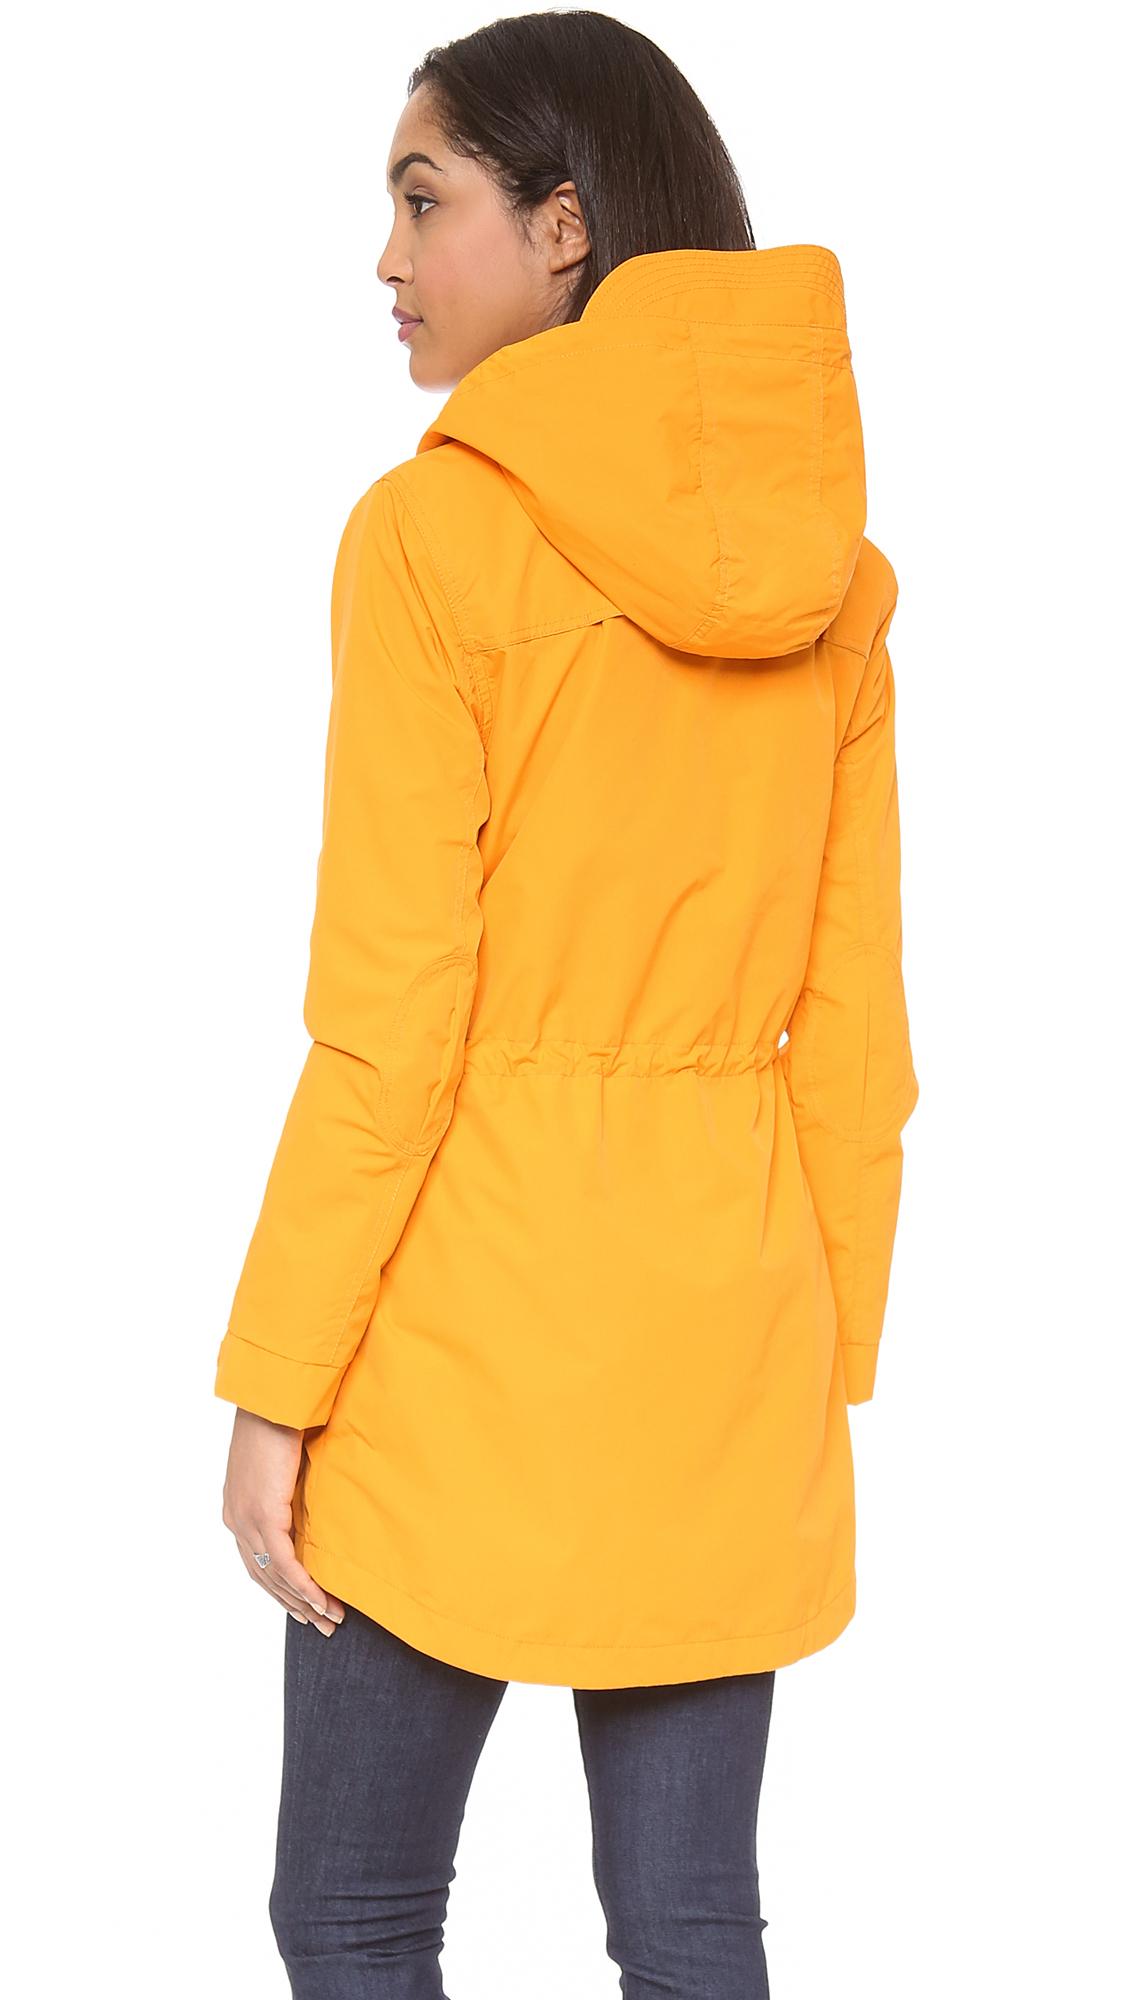 Penfield Weatherproof Zip Through Hooded Jacket Satsuma in Yellow ...